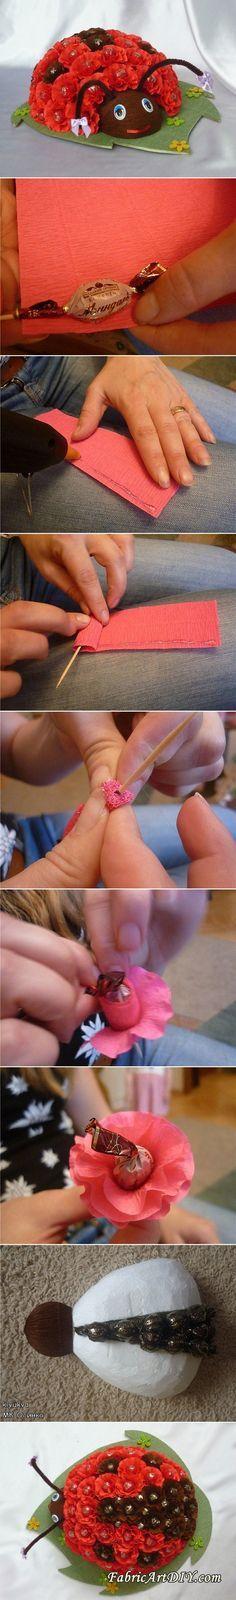 How to Make Chocolate Floral Ladybug Bouquet   www.FabArtDIY.com LIKE Us on Facebook ==> https://www.facebook.com/FabArtDIY